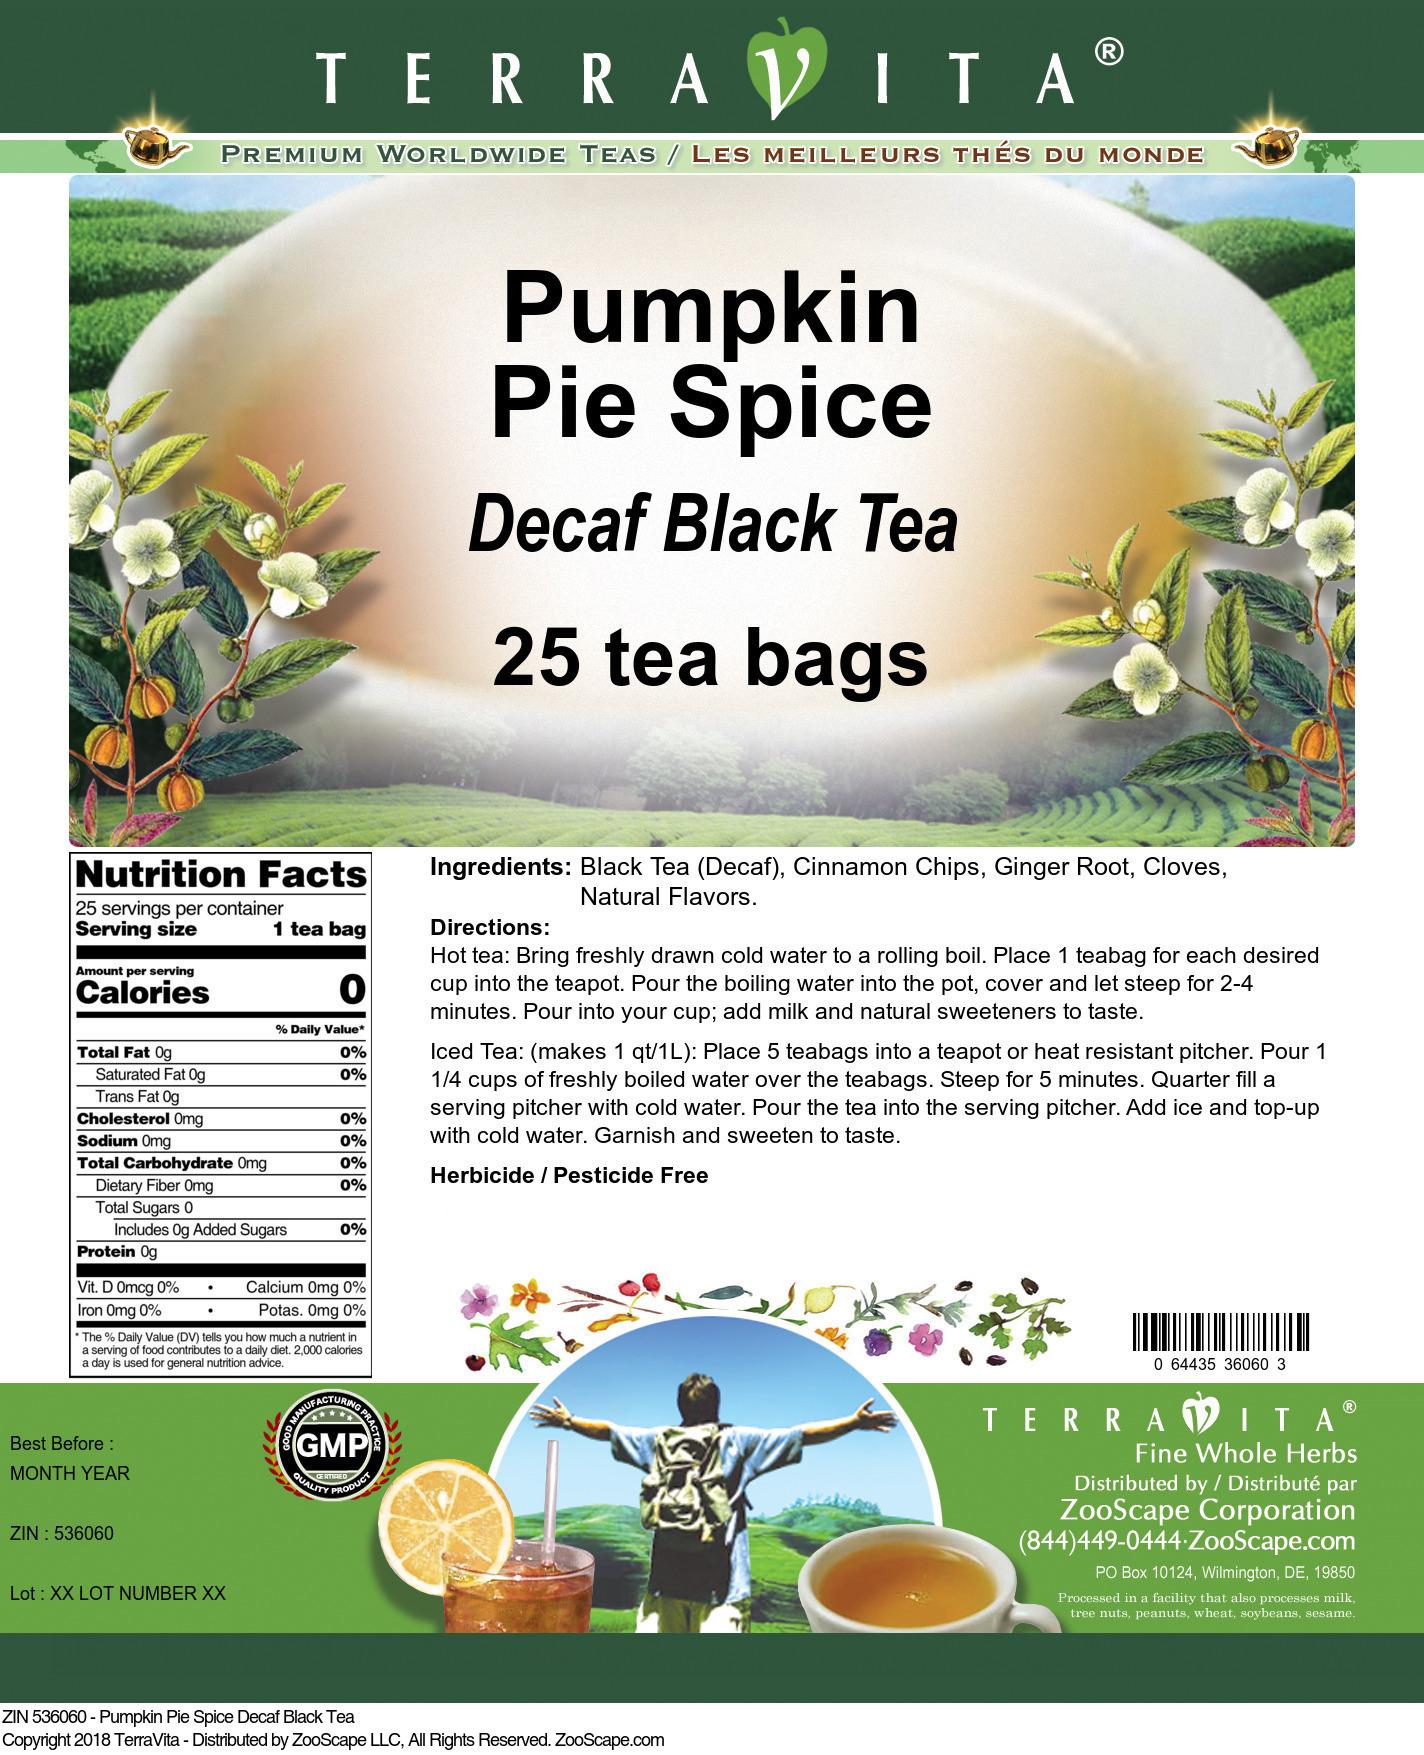 Pumpkin Pie Spice Decaf Black Tea